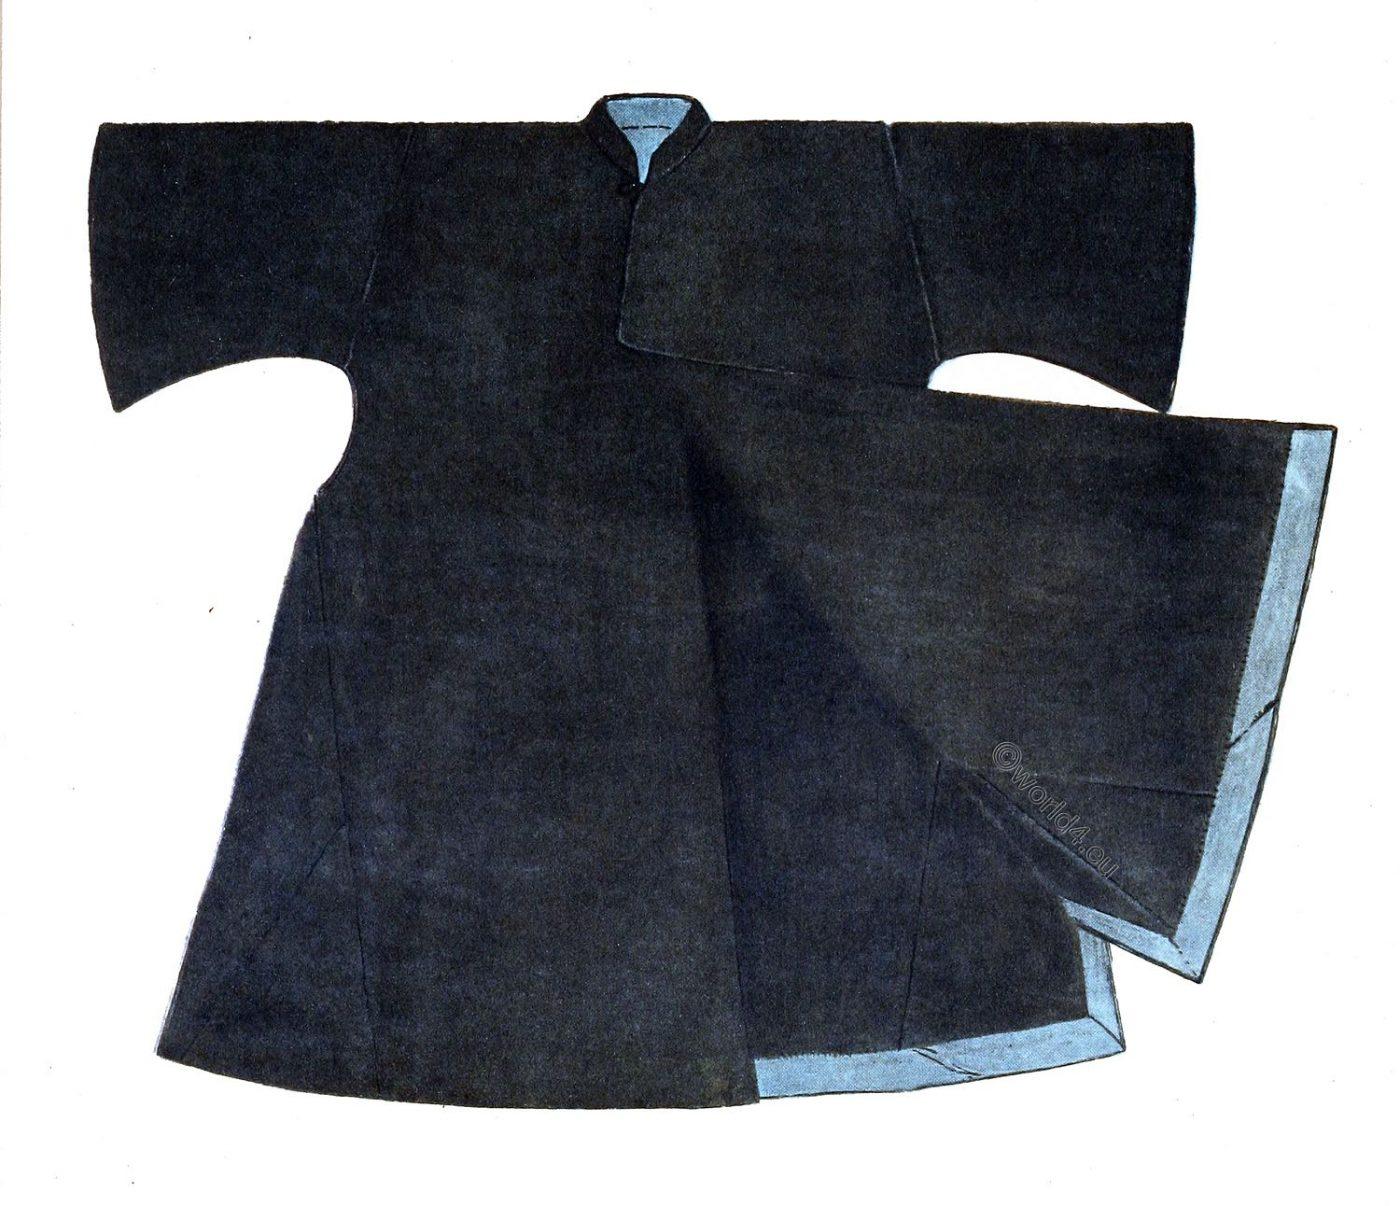 Binish, overcoat, Max Tilke, arabia, egyptian, clothing